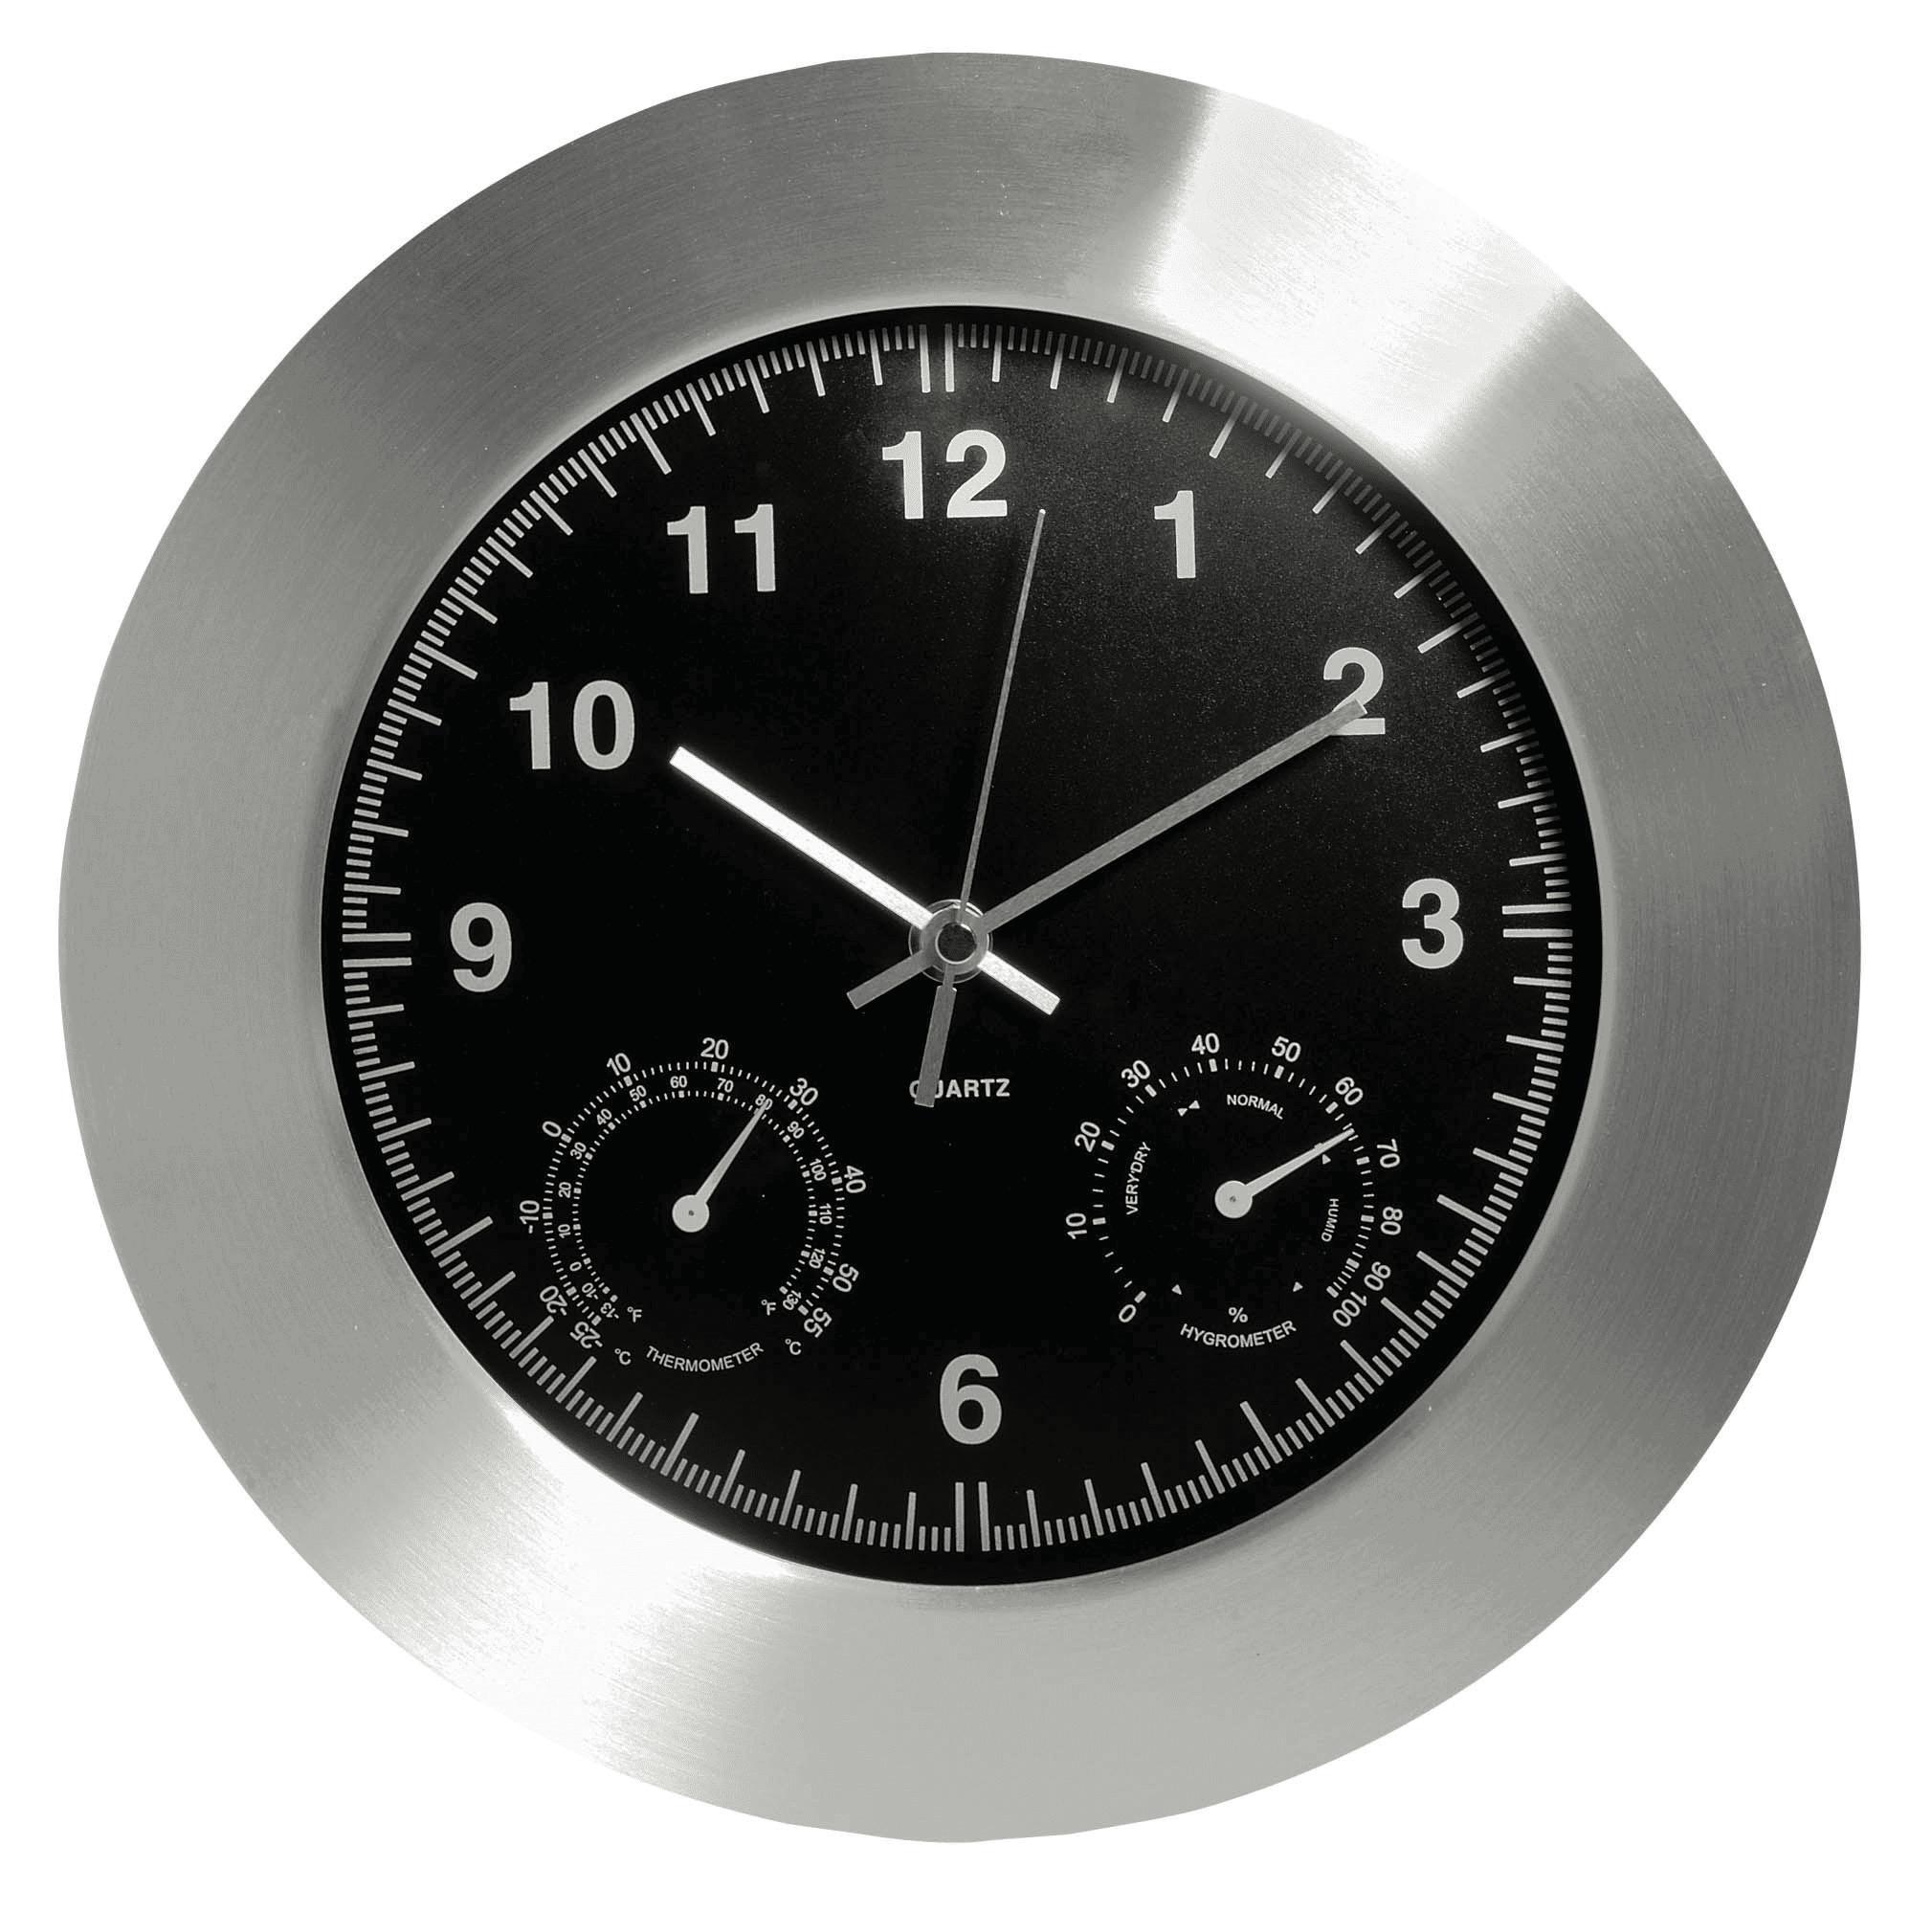 Eddingtons Weather Station Wall Clock With Hygrometer